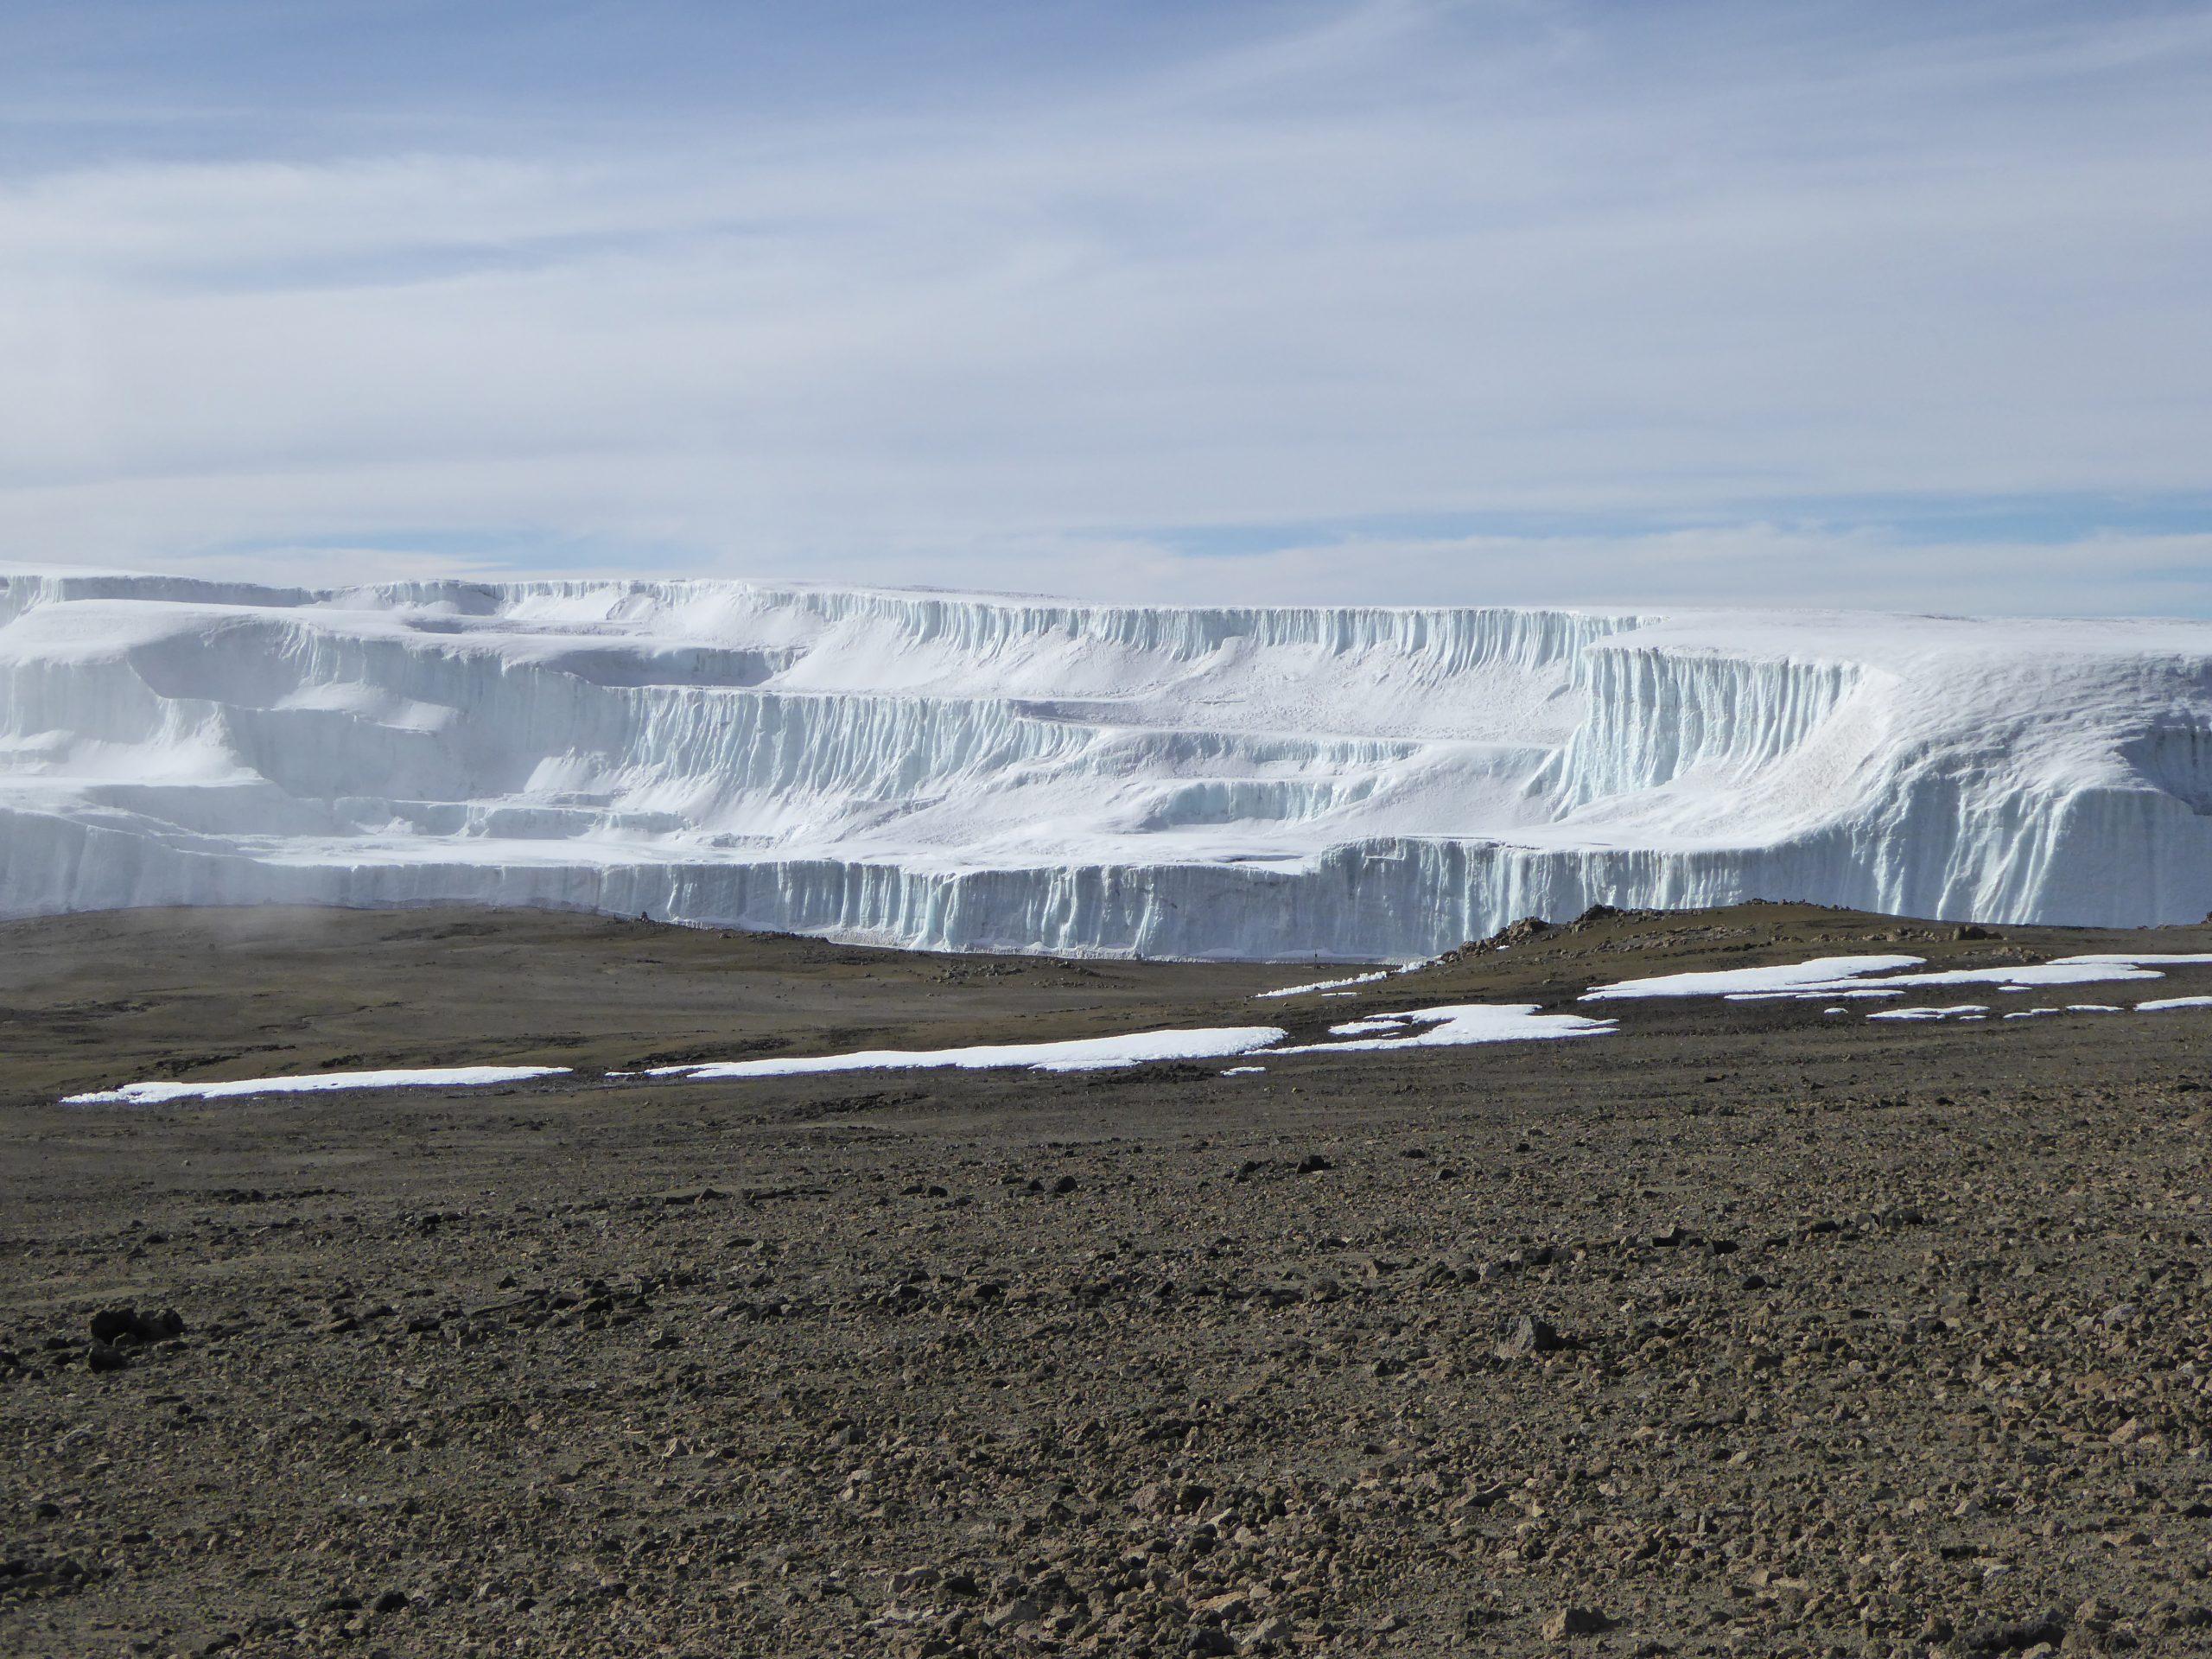 Radreise Afrika 2014 - Kilimanjaro - Drygalski-Gletscher